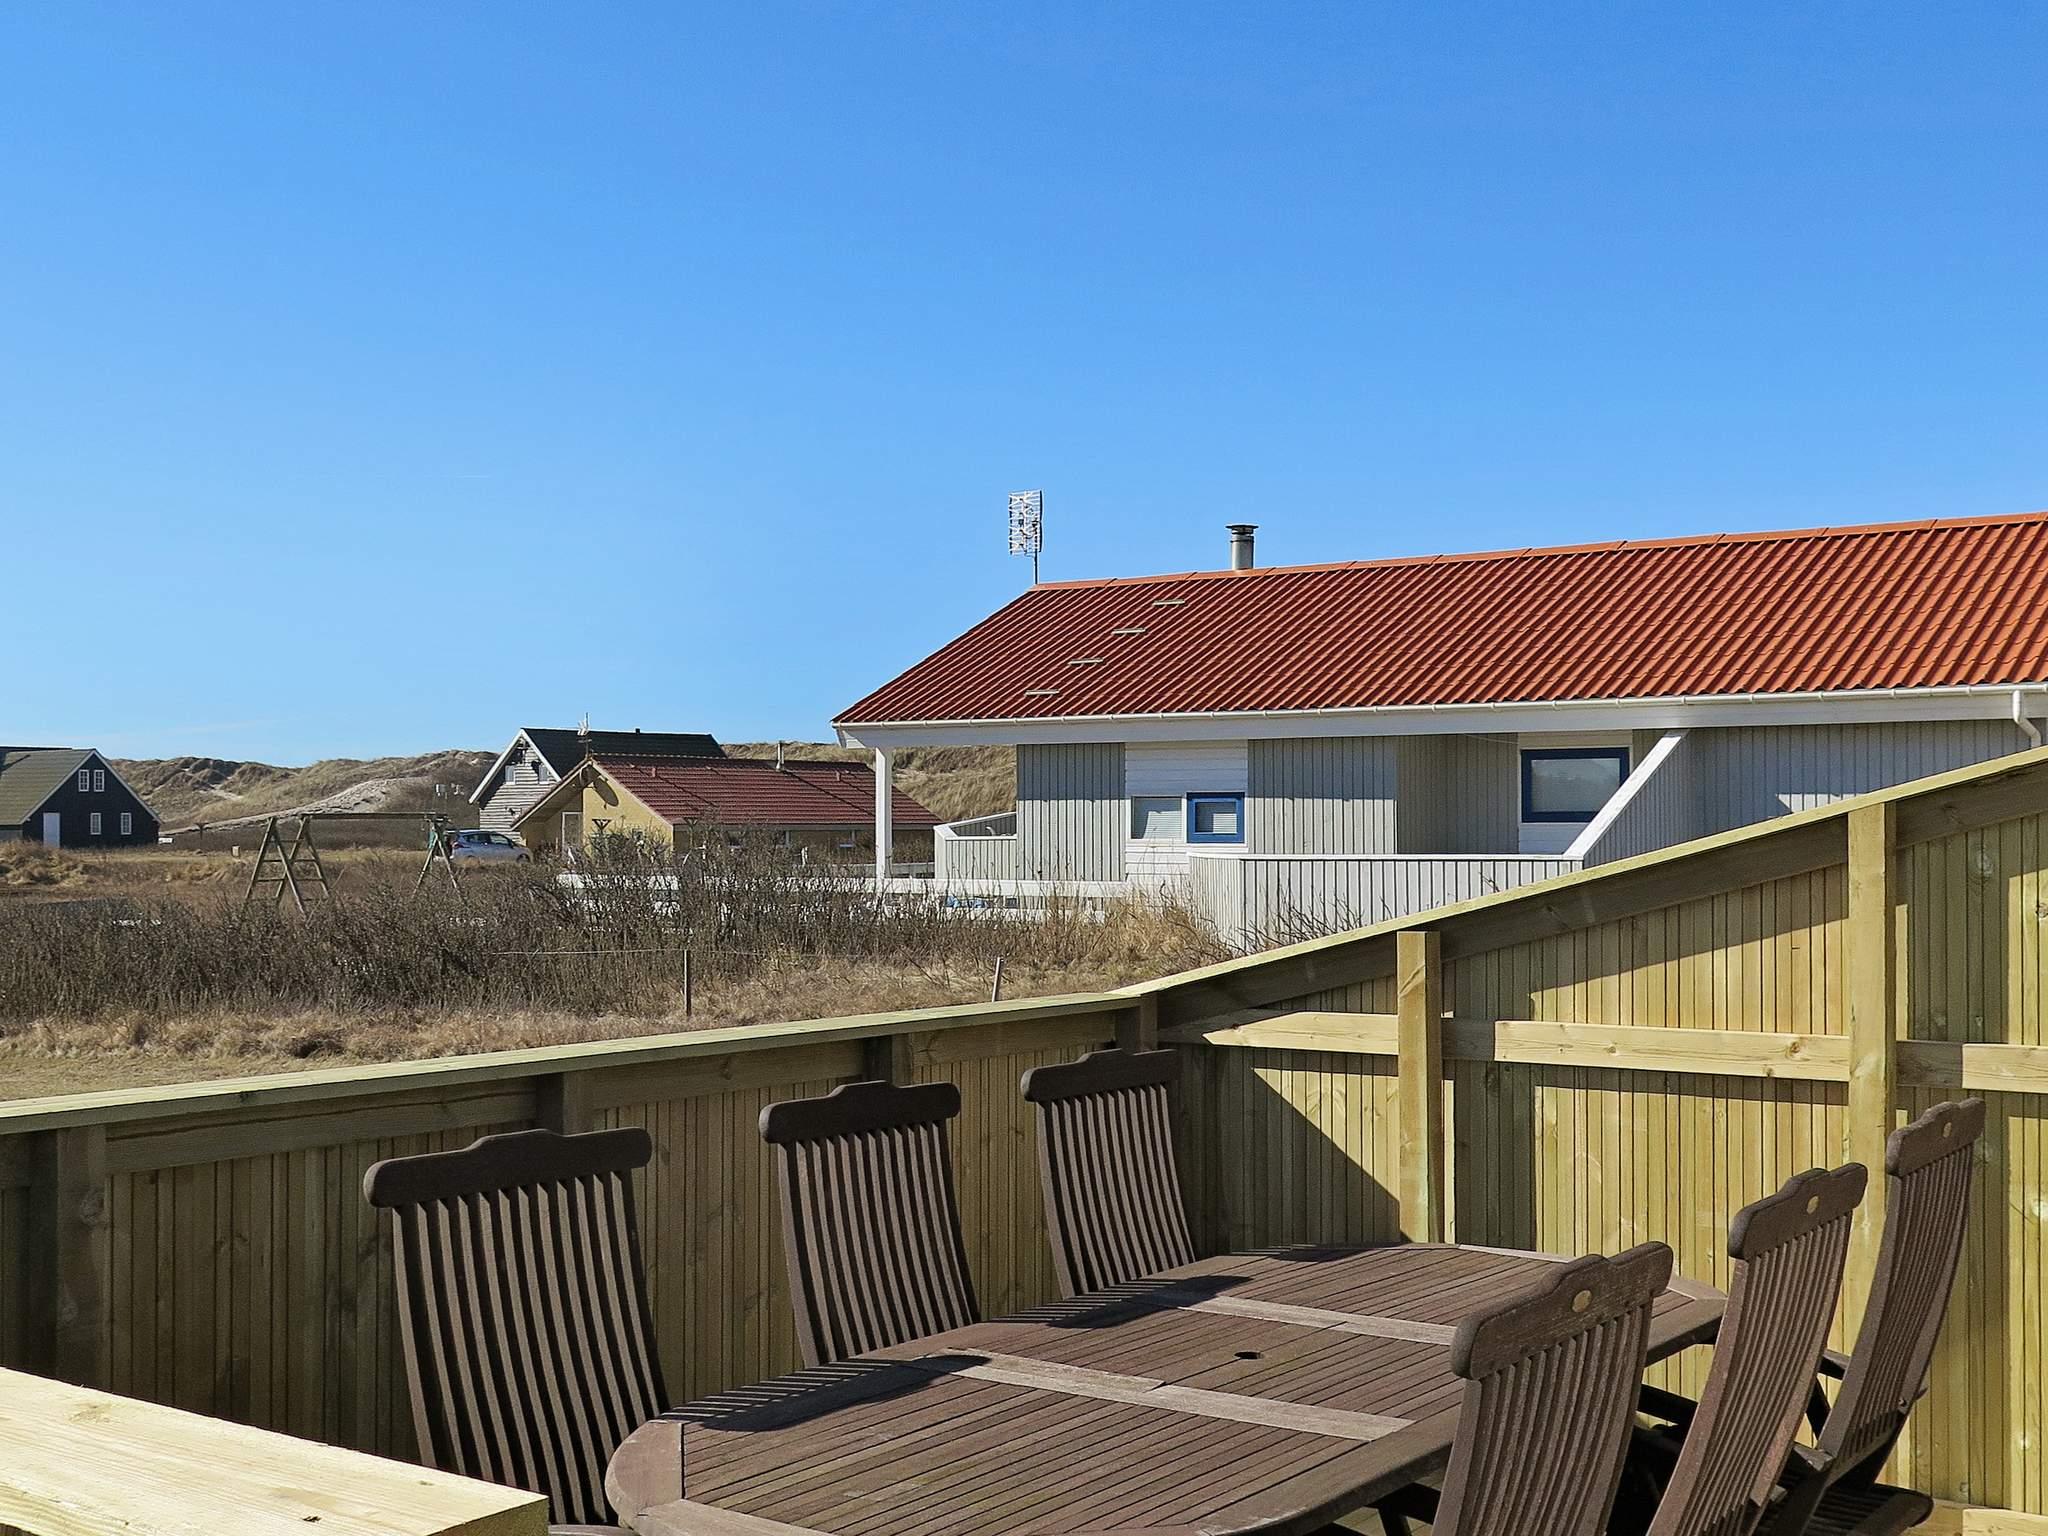 Ferienhaus Vrist (293960), Vrist, , Limfjord, Dänemark, Bild 15